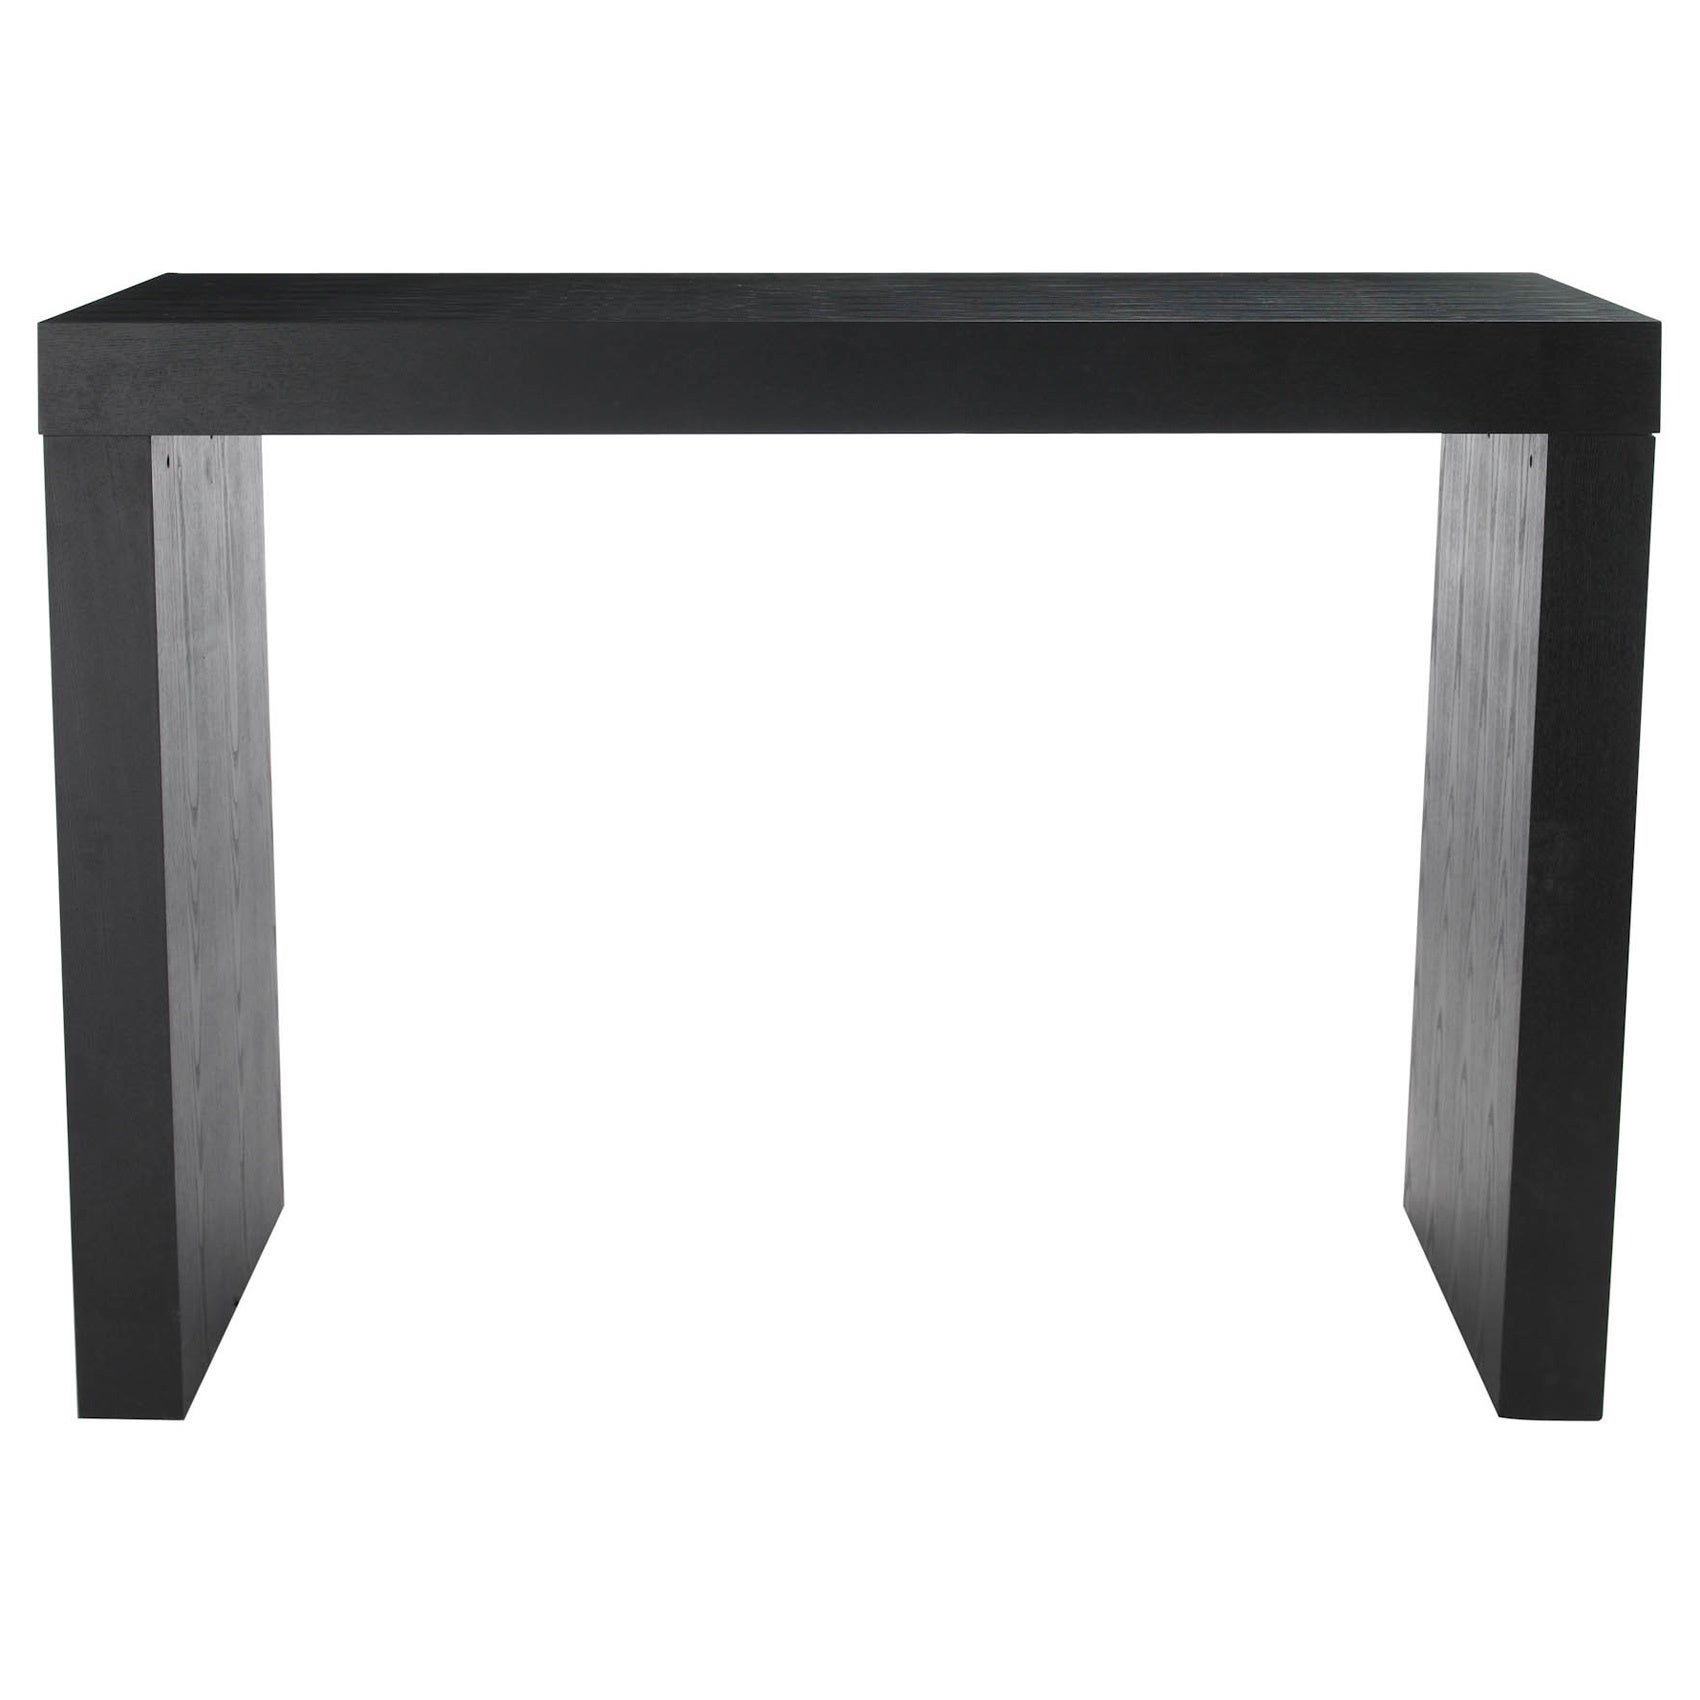 Merveilleux Shop U0027Ikonu0027 Faro High Gloss C Shape Bar Height Table   On Sale   Free  Shipping Today   Overstock.com   9216630